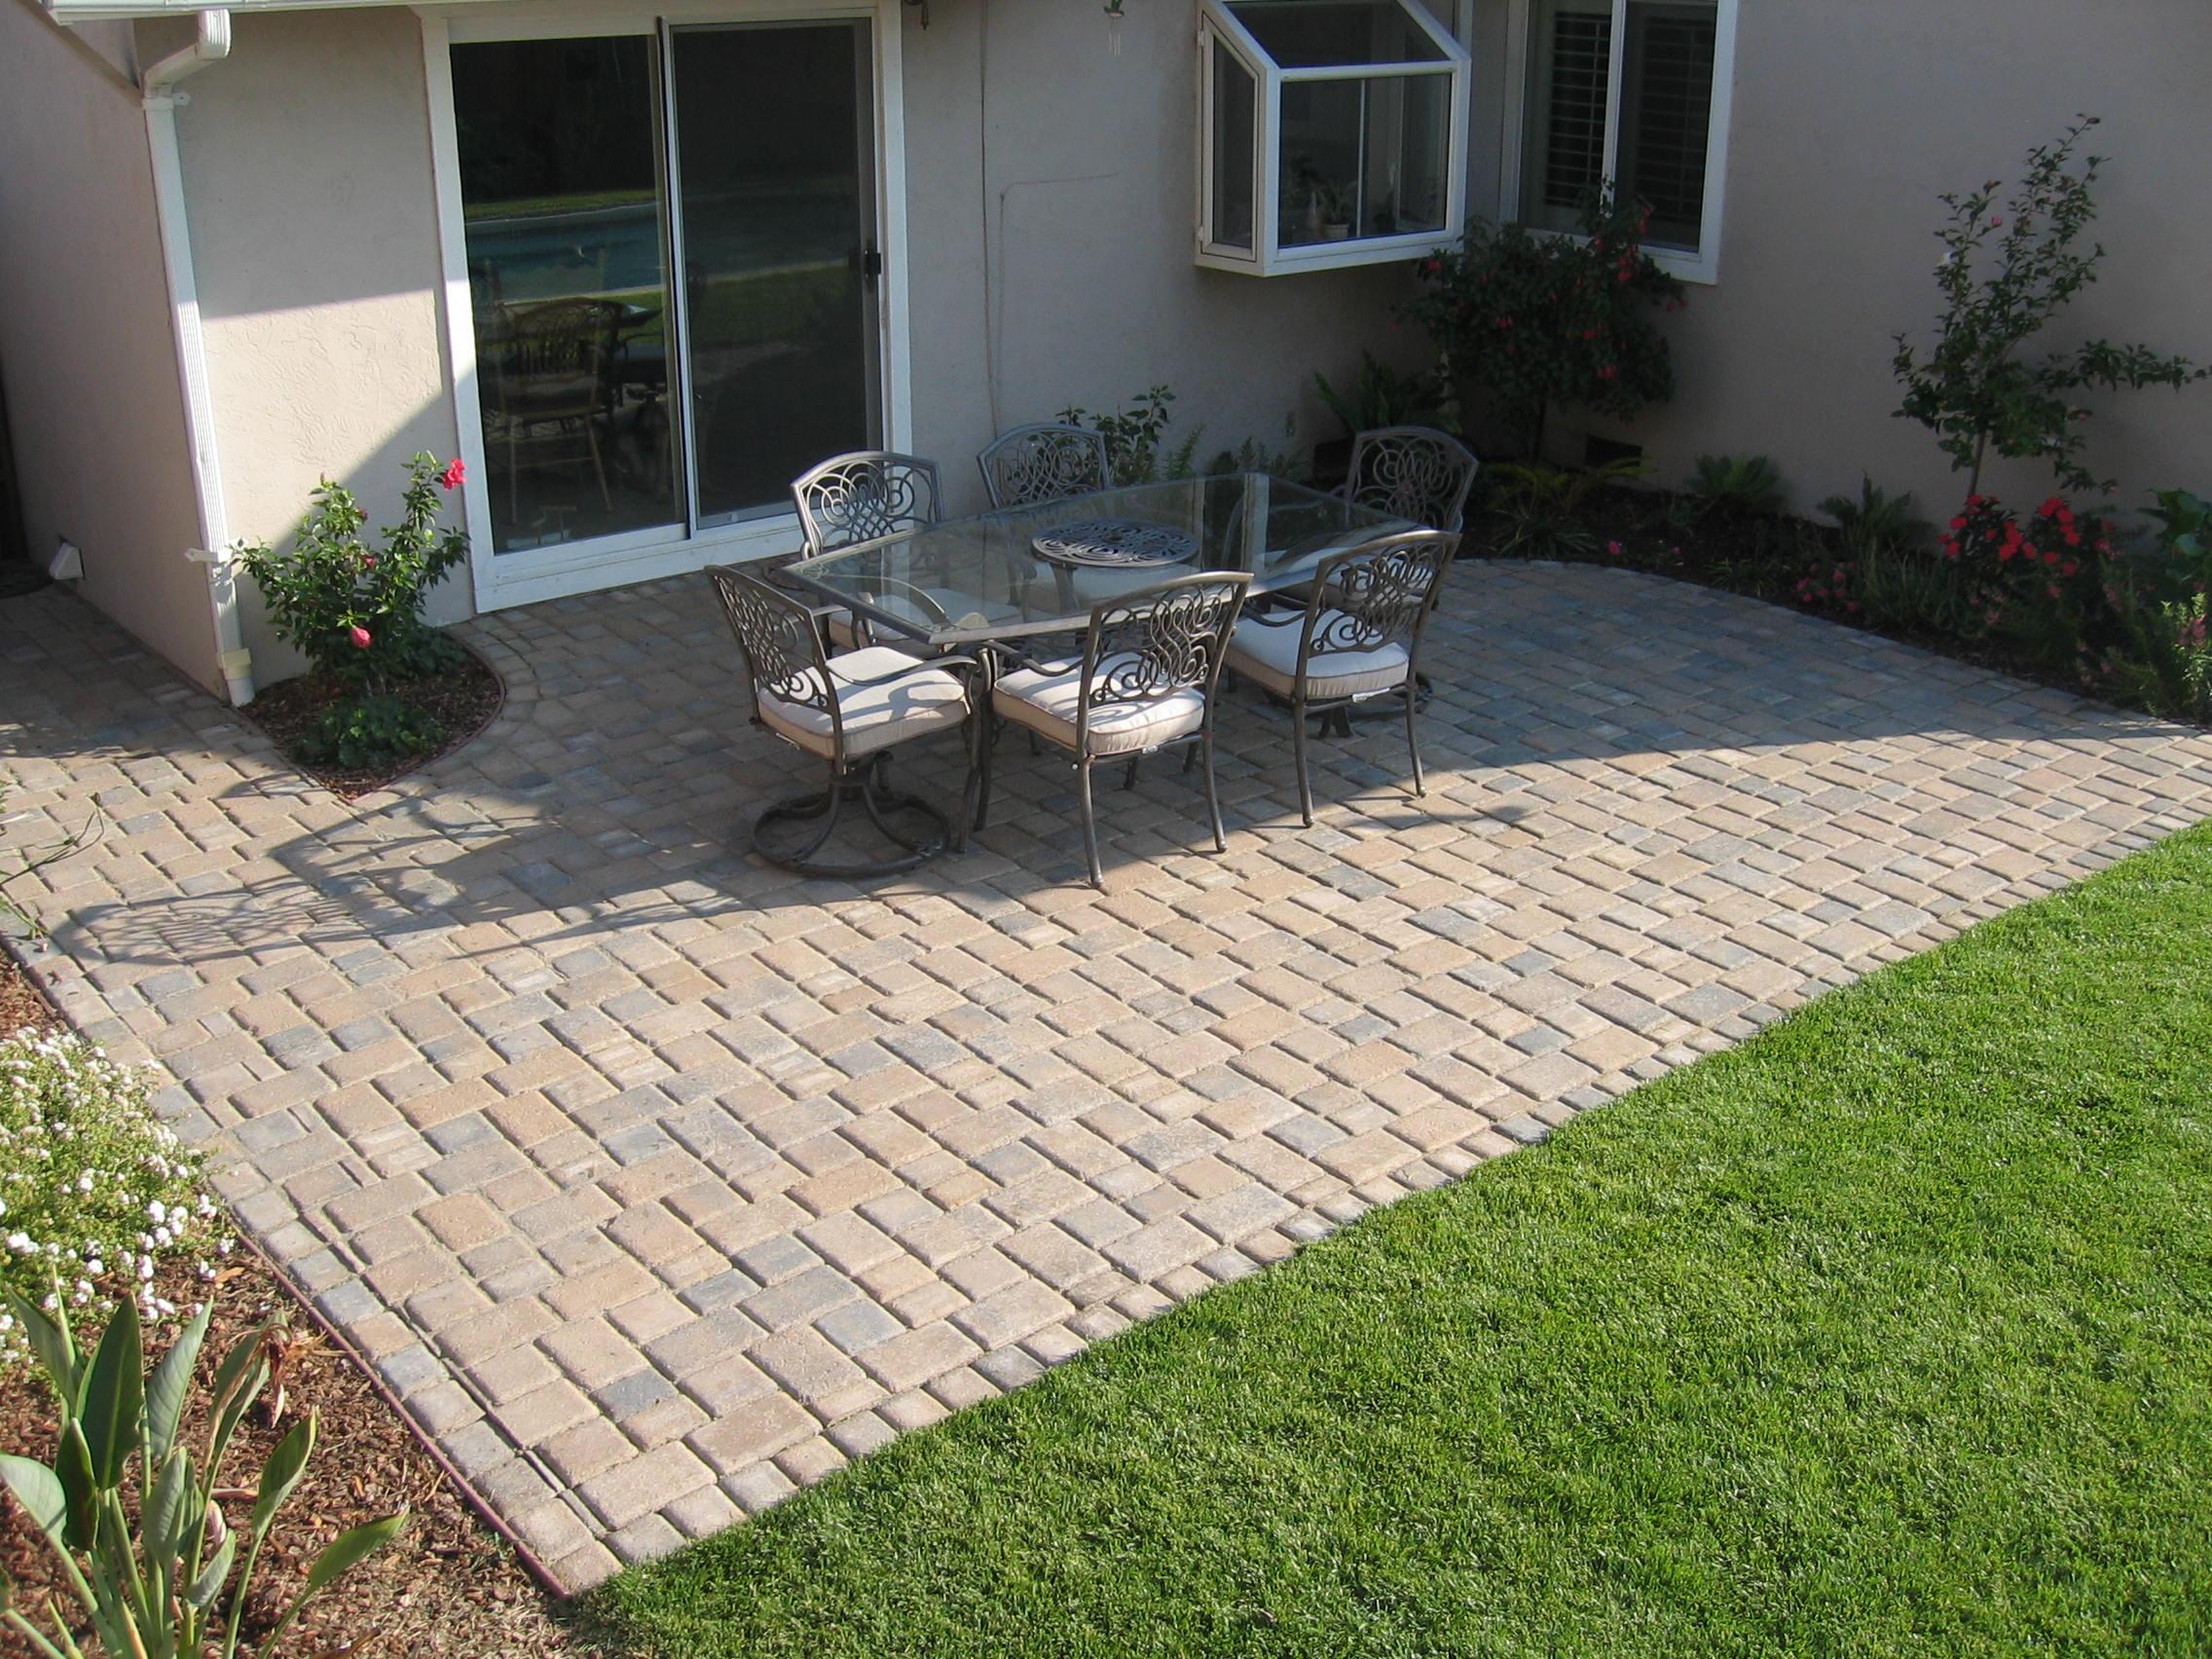 Rectangular Paver Patio Designs • Patio Ideas on Small Backyard Brick Patio Ideas id=49498